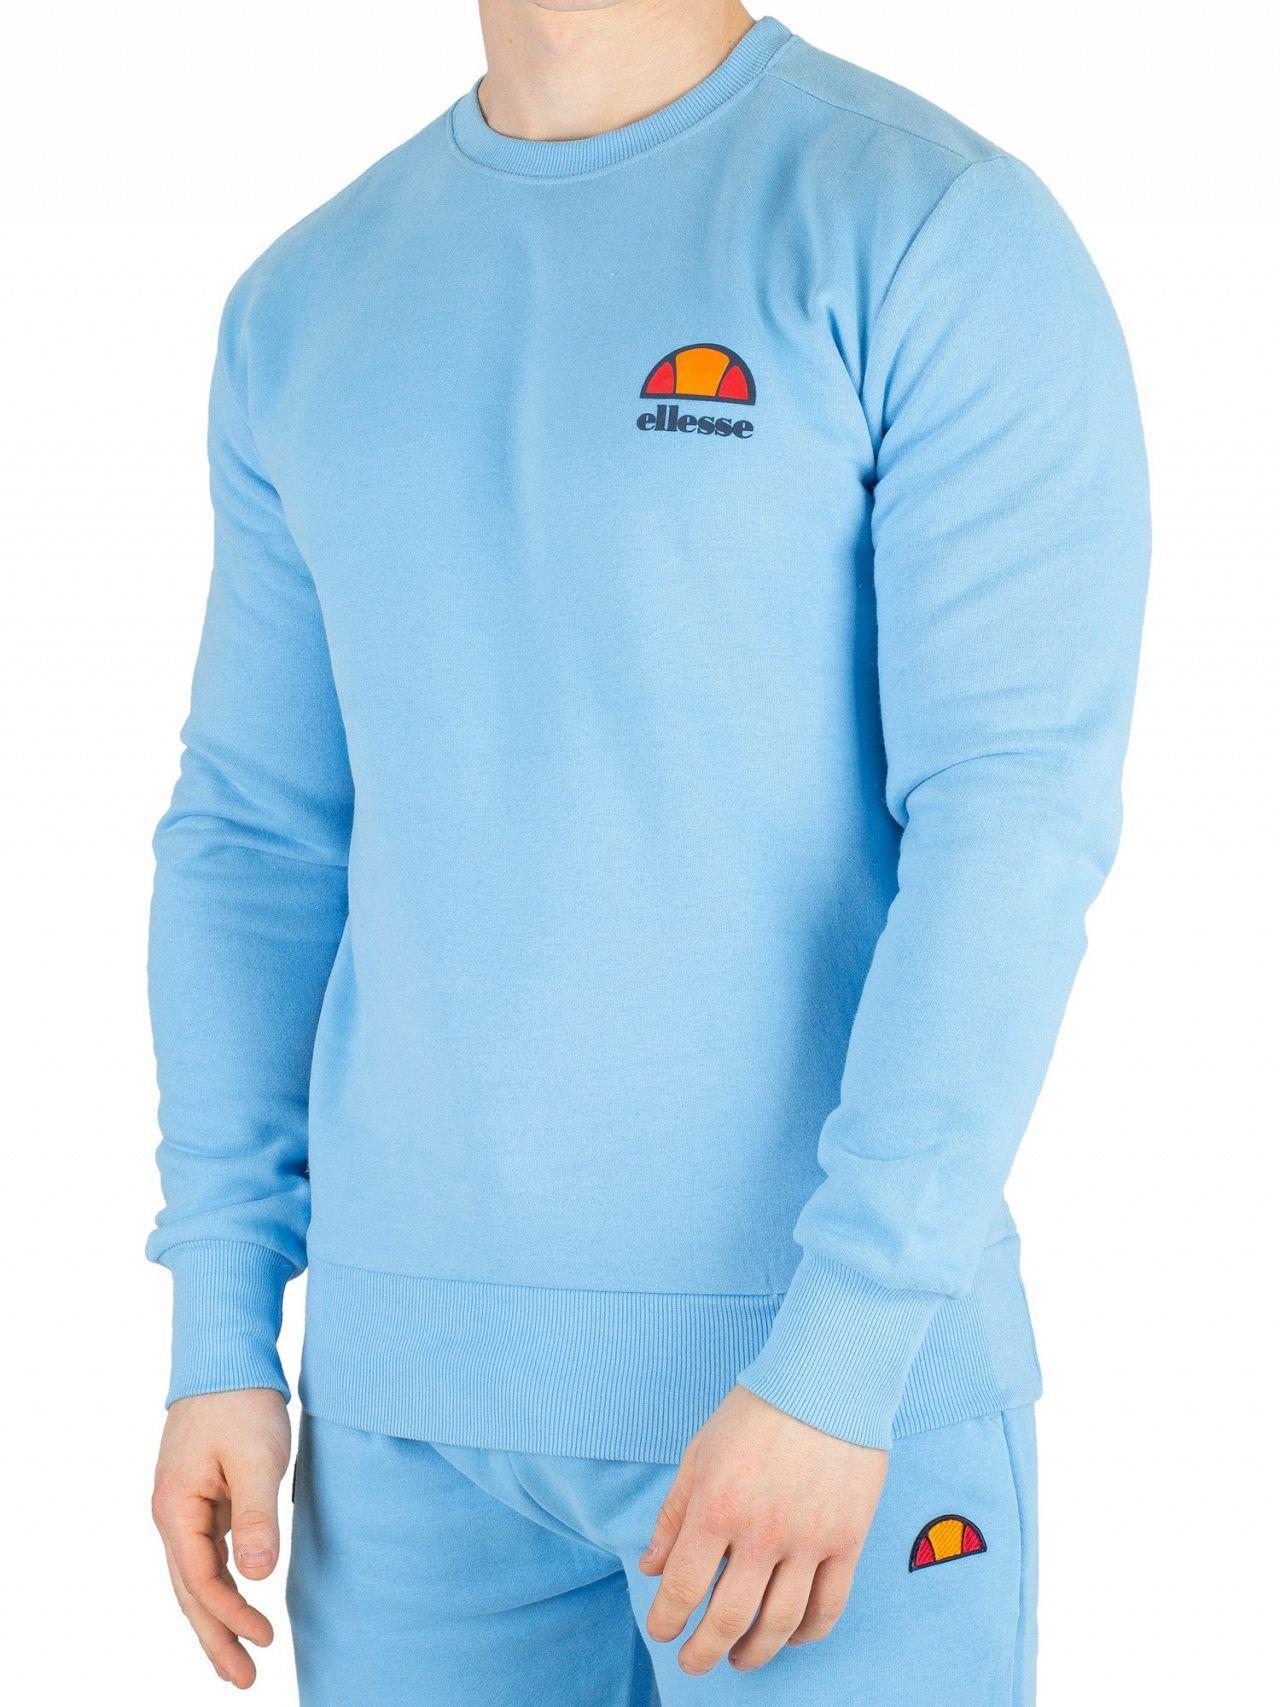 27f068d894 Lyst - Ellesse Light Blue Diveria Sweatshirt in Blue for Men